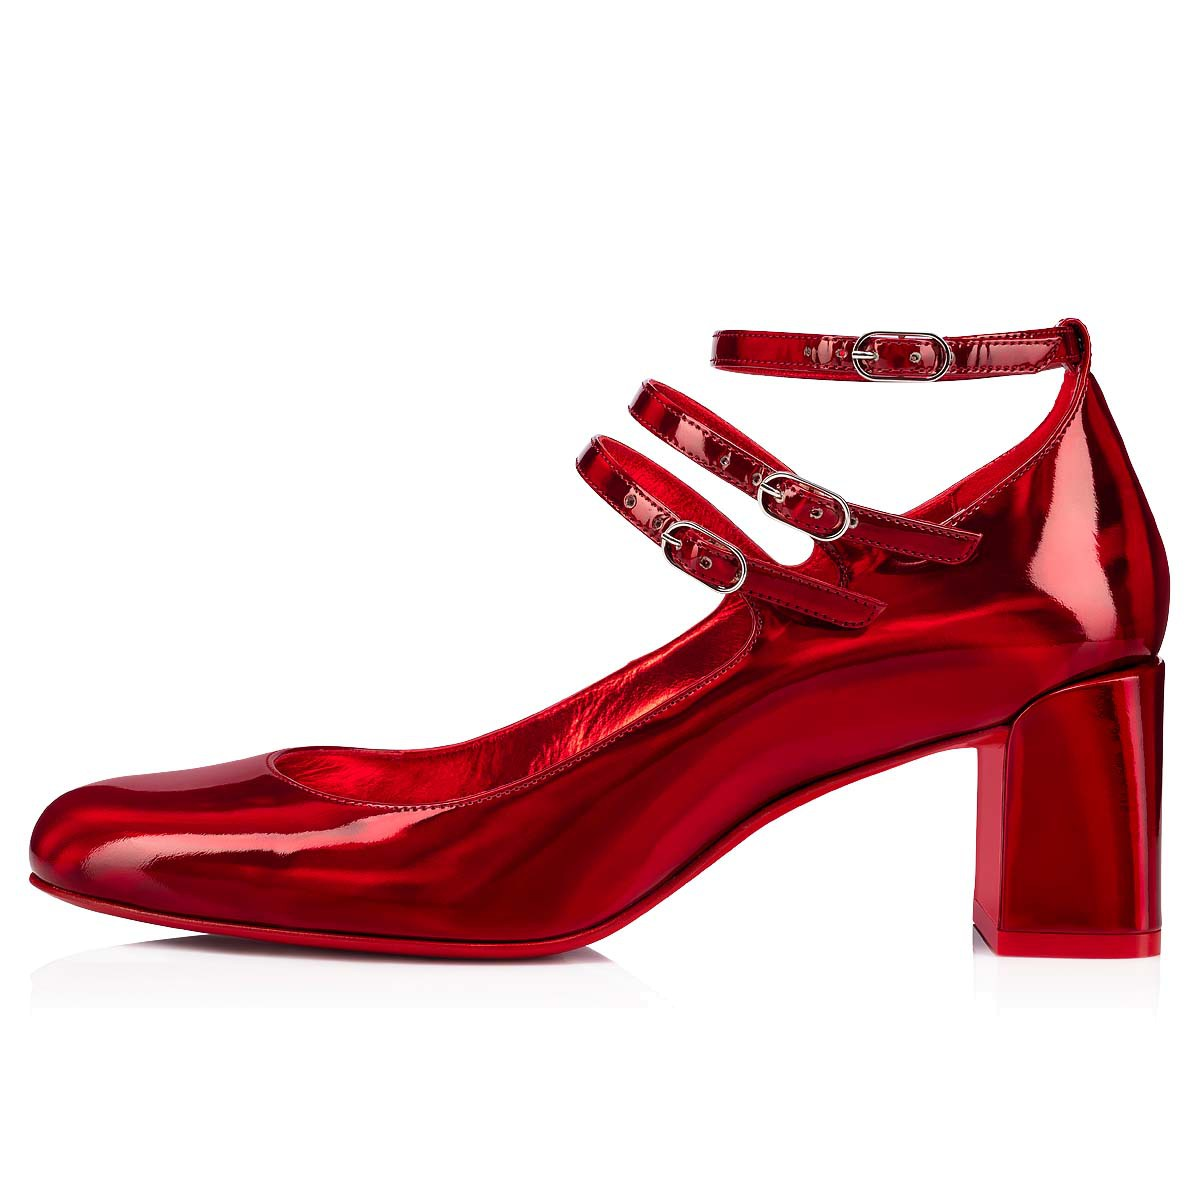 Shoes - Vernica - Christian Louboutin